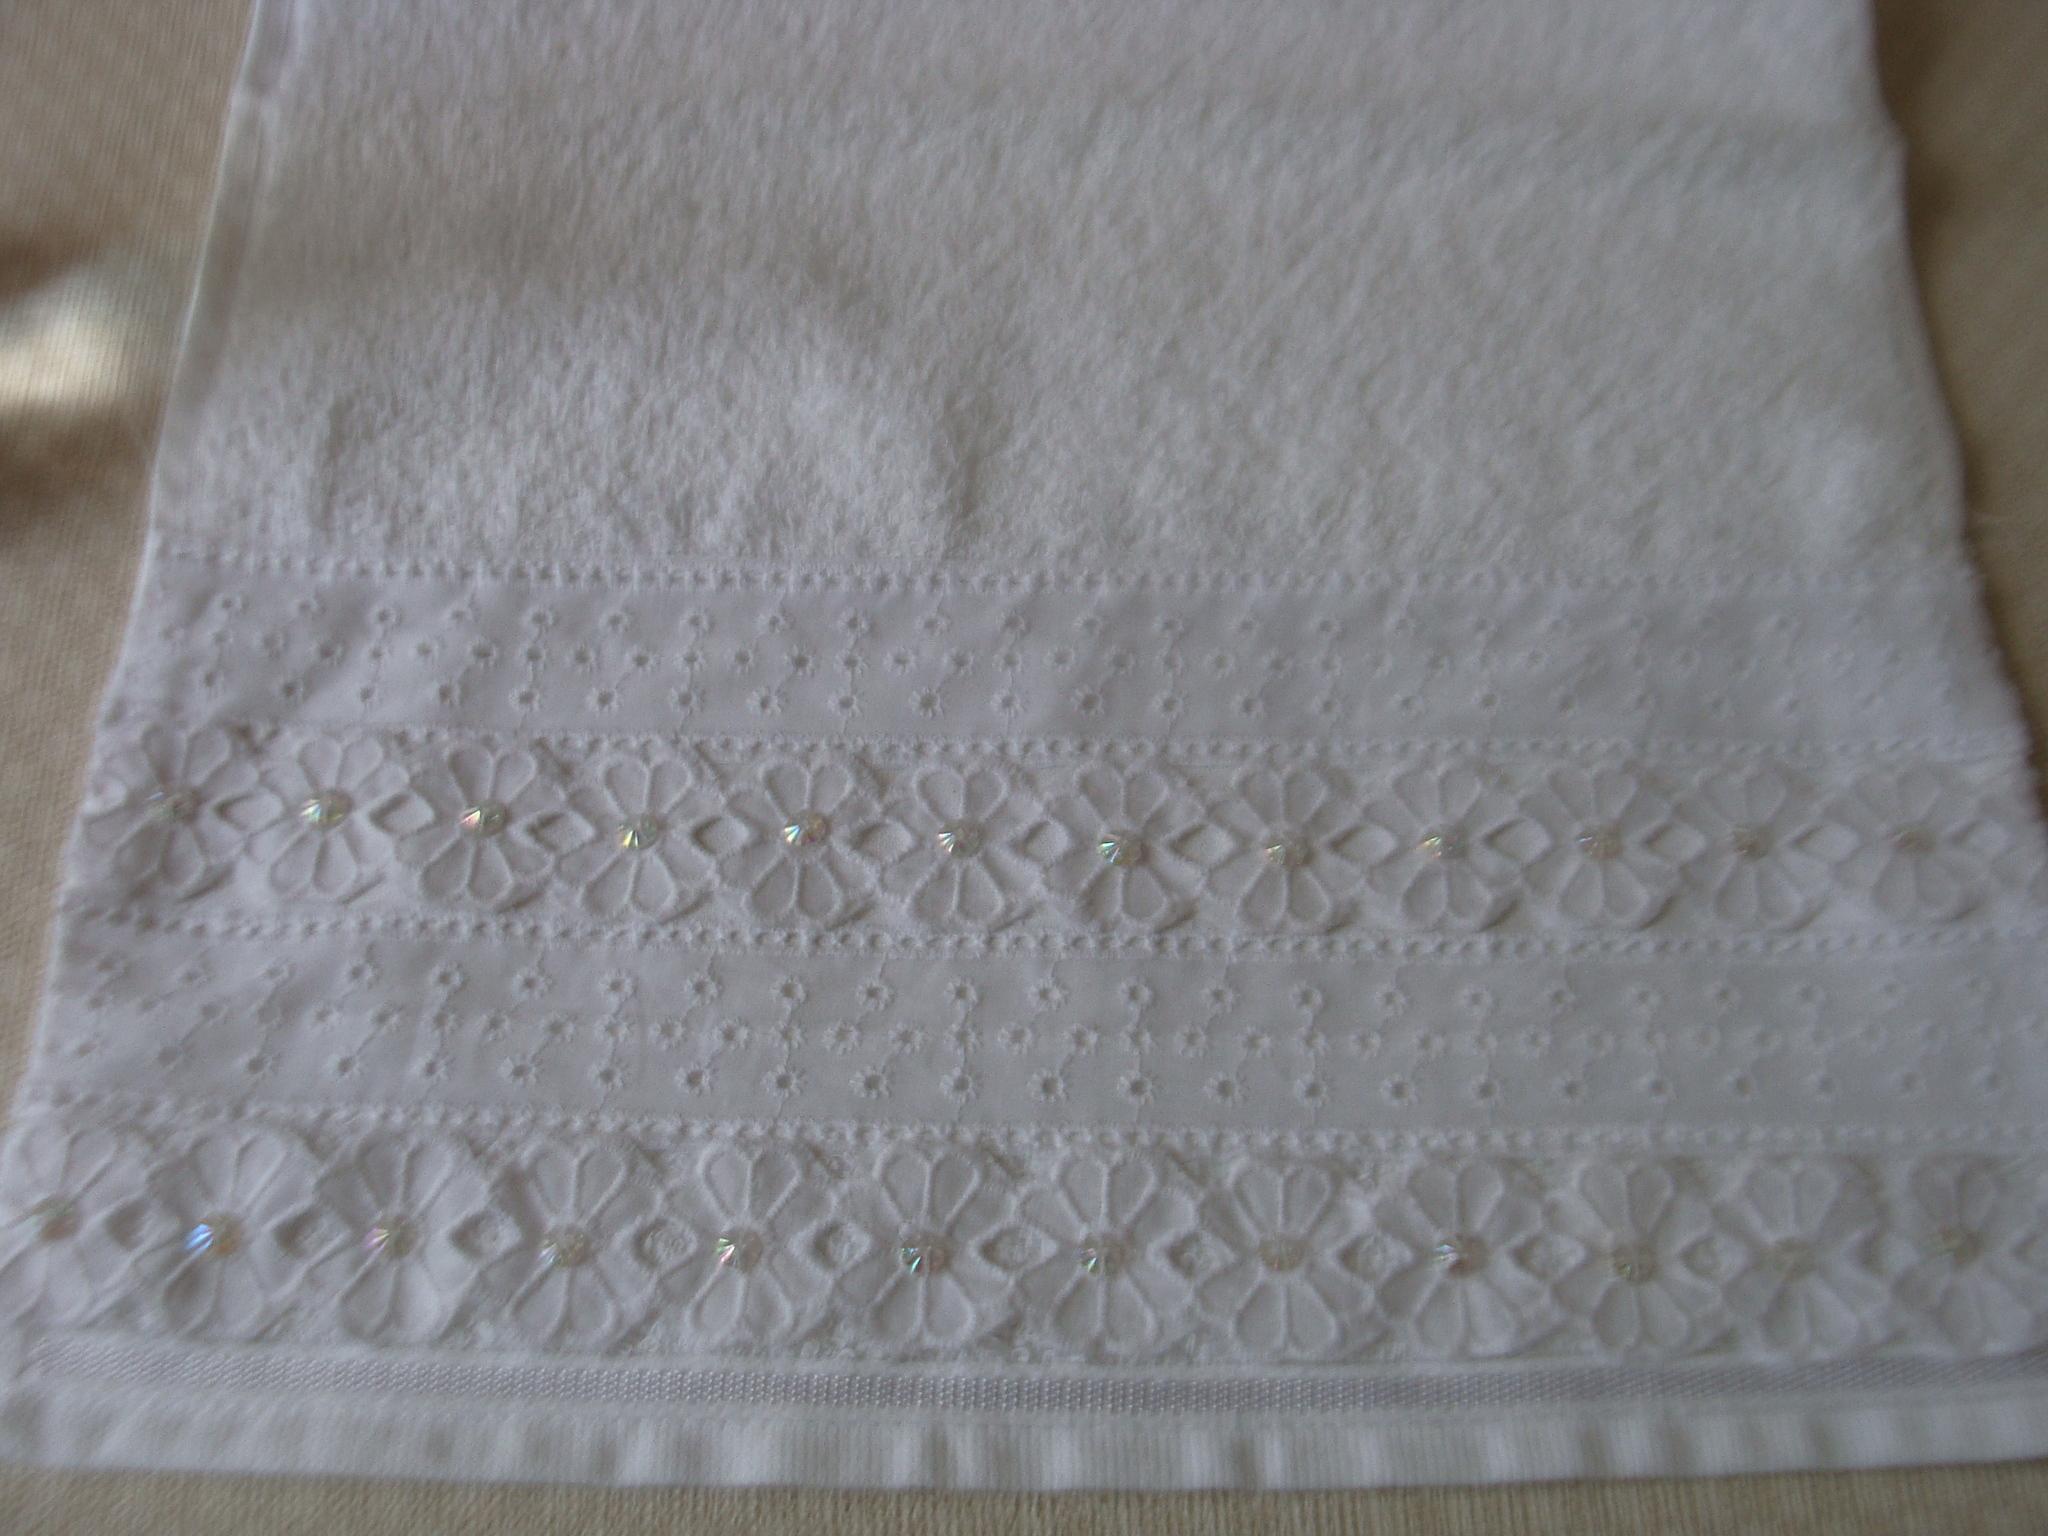 decoracao toalha lavabo:toalhas lavabo flores toalhas lavabo flores